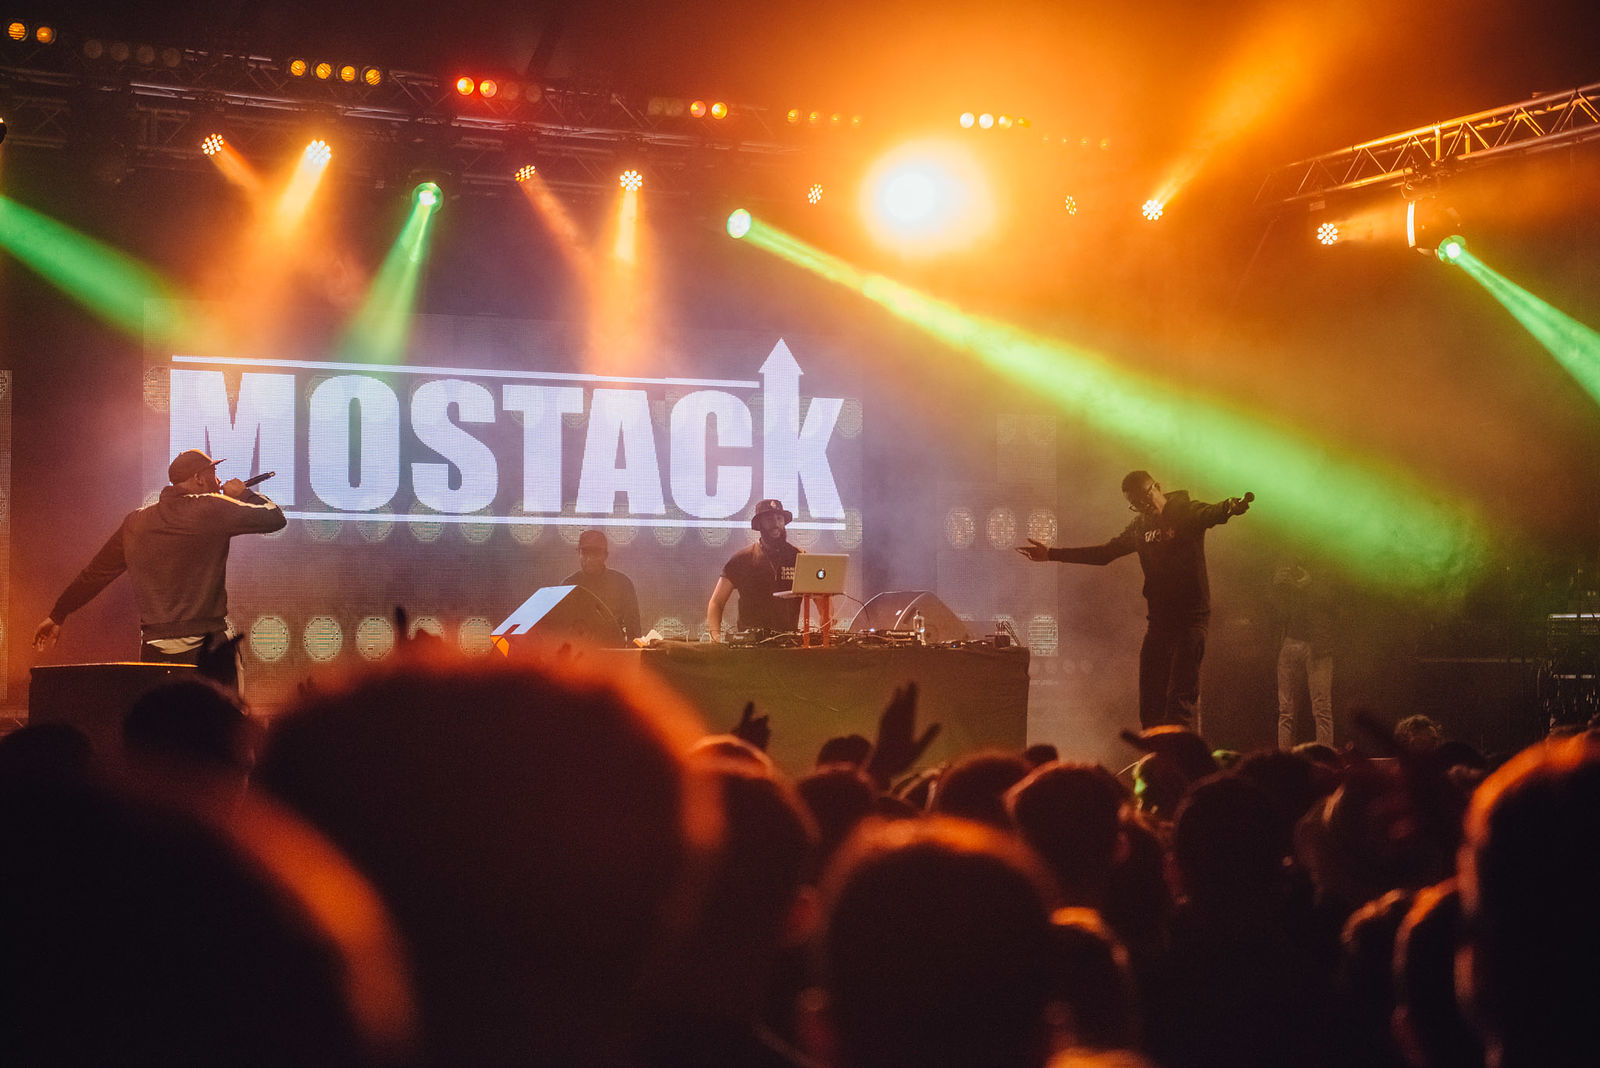 Mostack